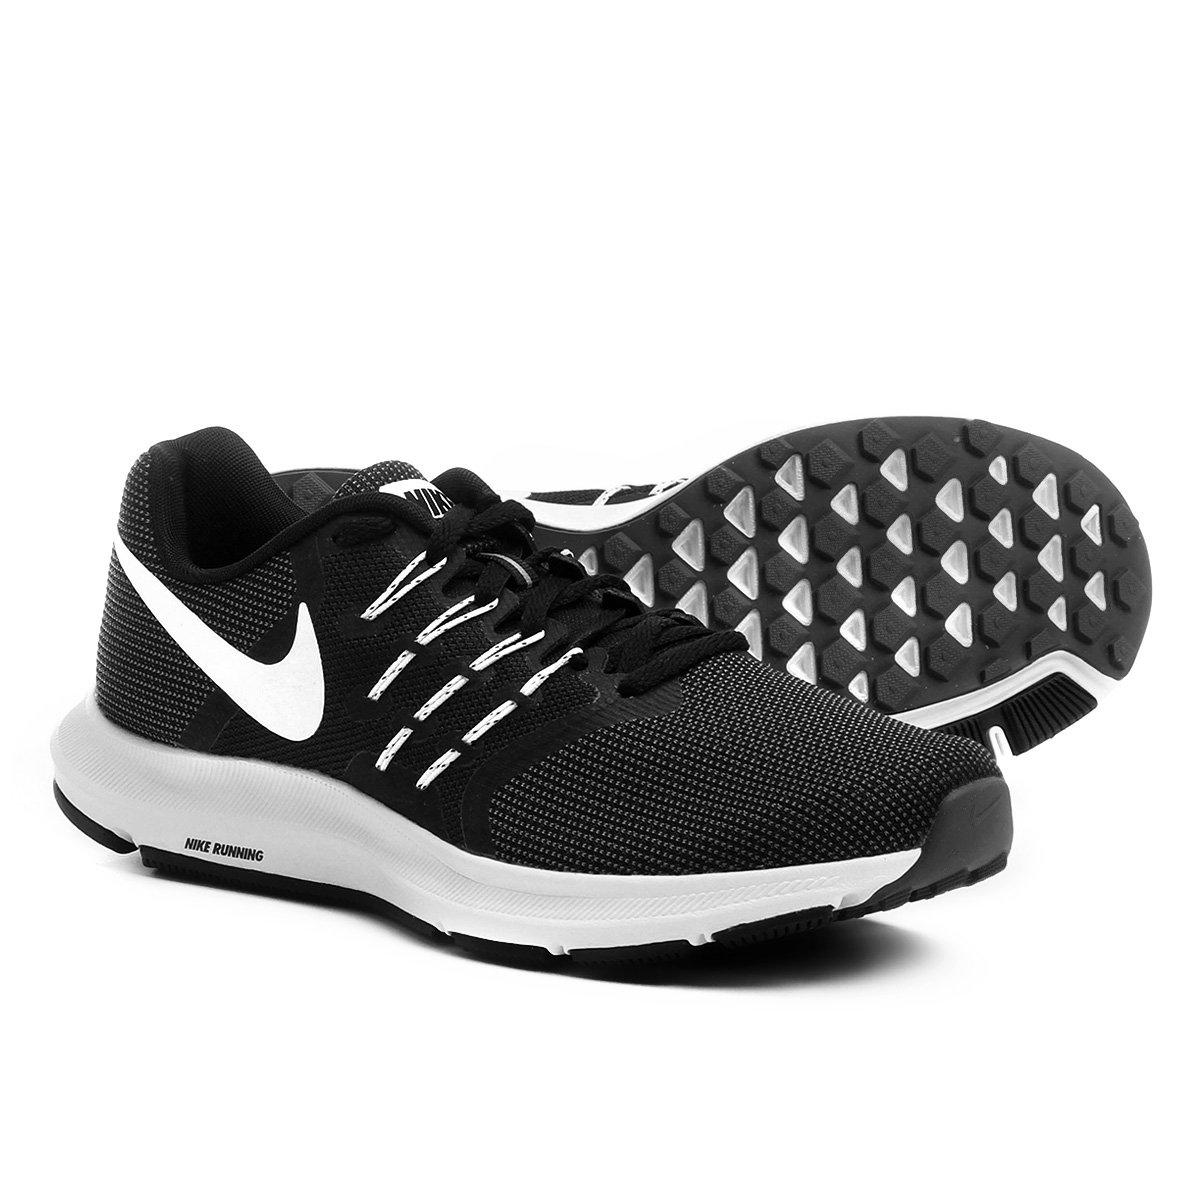 fe524c4ad Tênis Nike Run Swift Masculino - Compre Agora